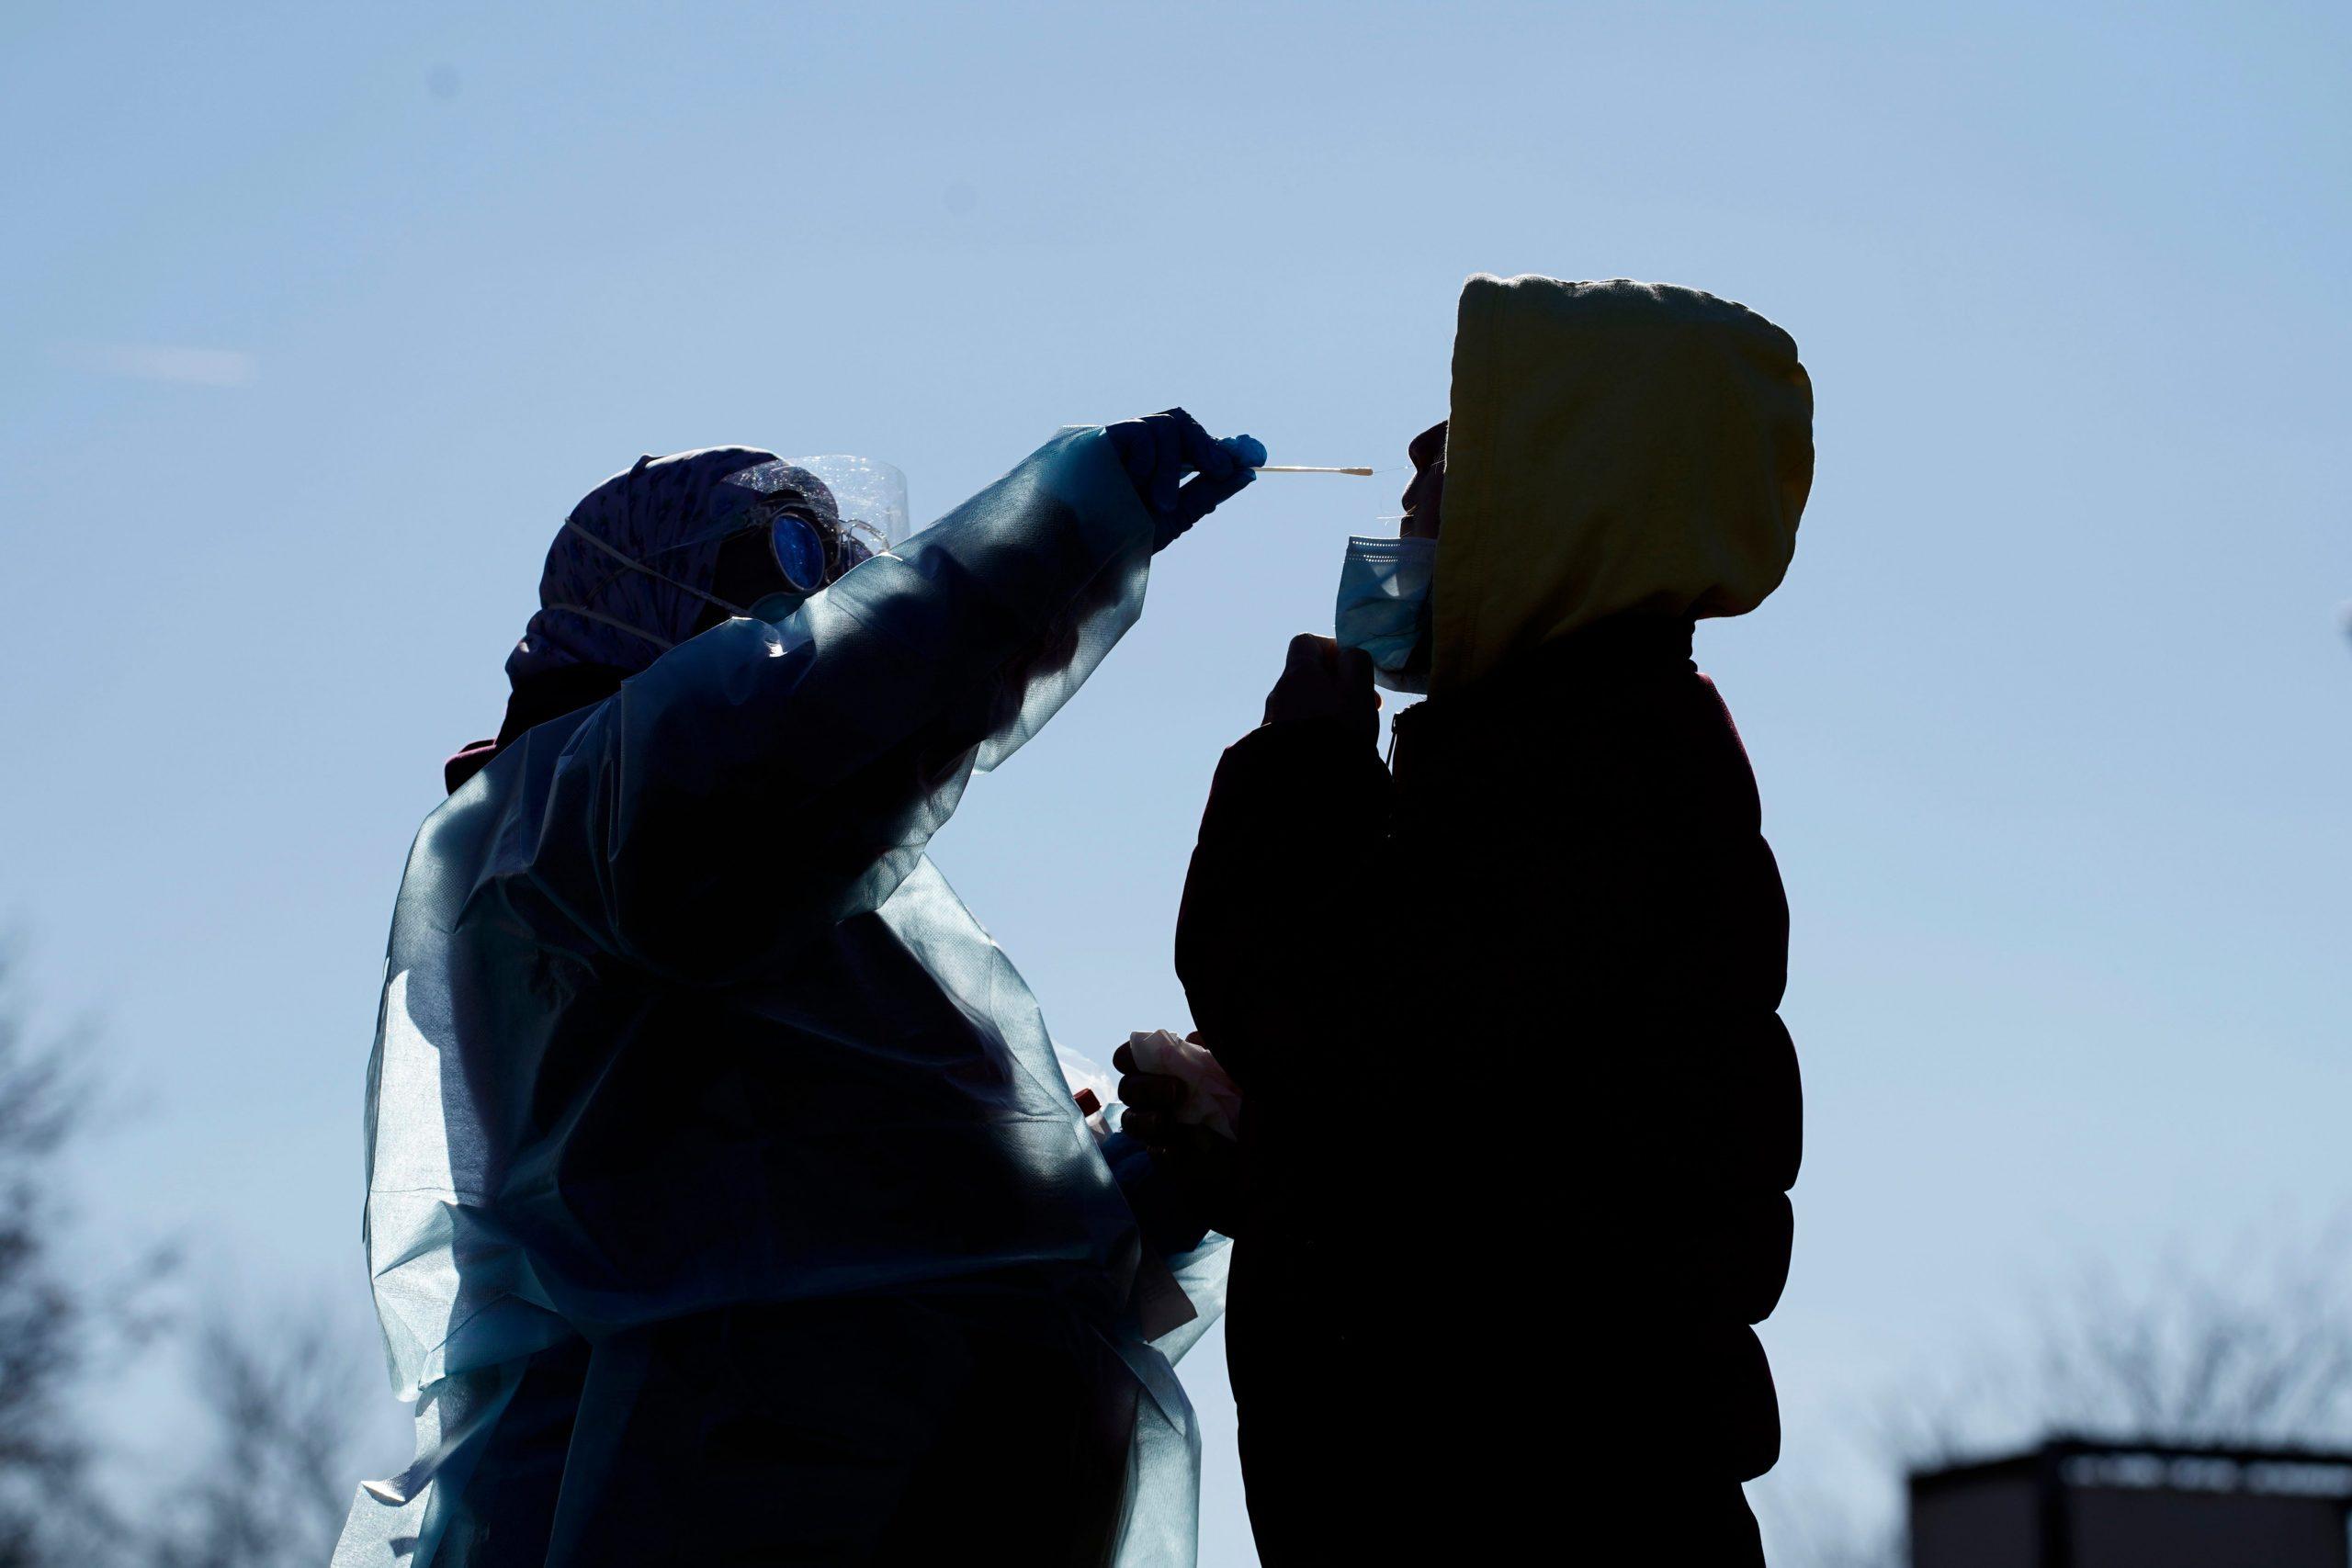 Coronavirus updates: Pfizer vaccine awaits FDA authorization; Boston conference led to 205-300K global cases, study says; 292K US deaths 1